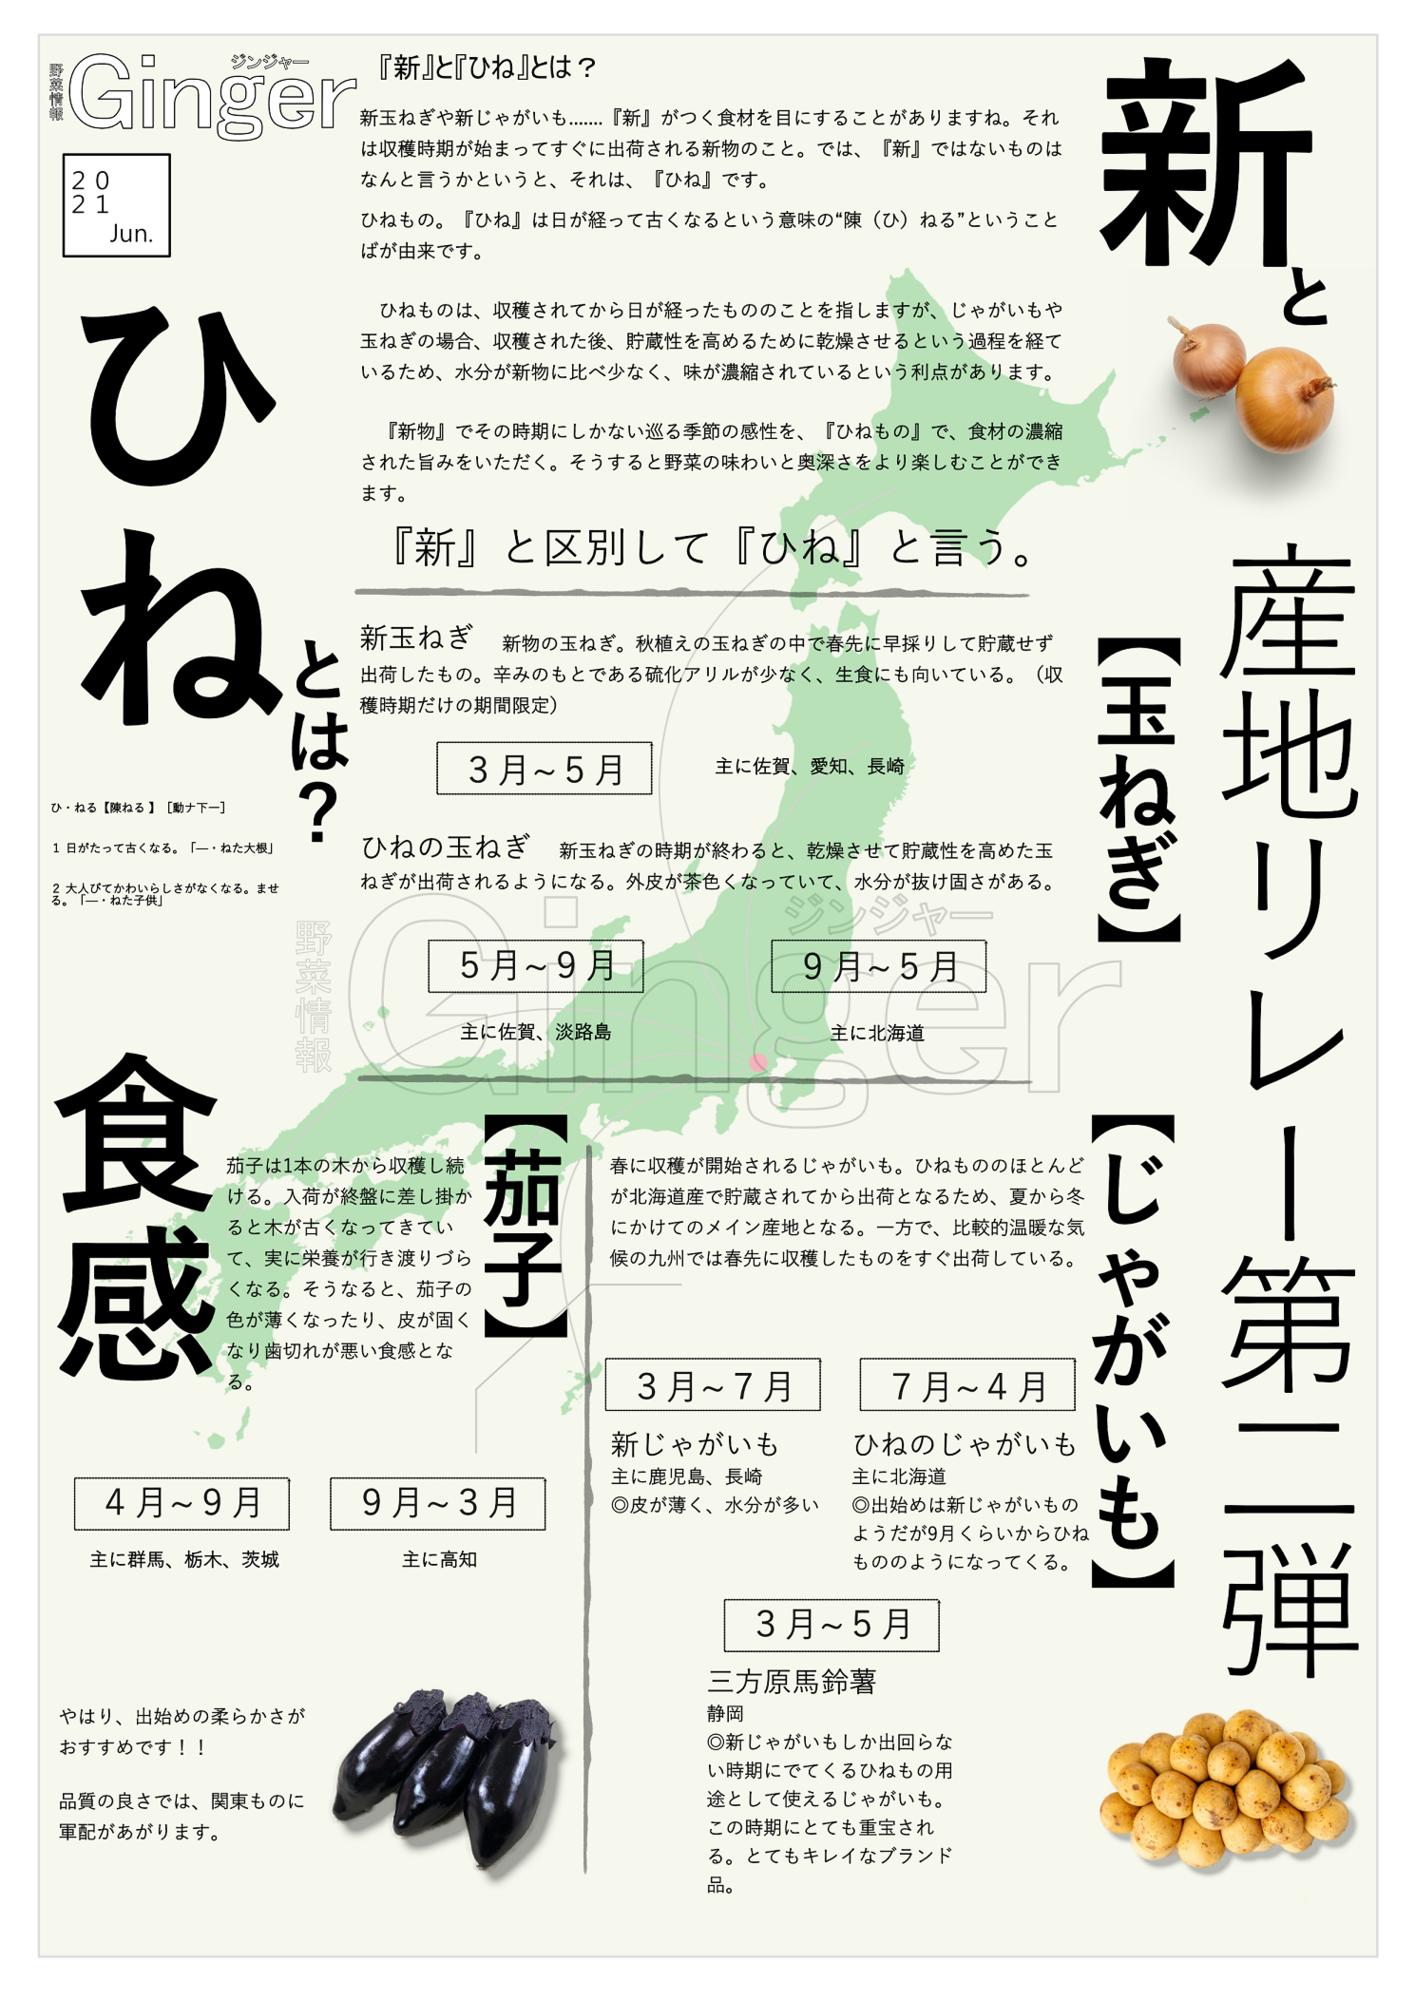 f:id:marusugi-2237:20210603142418p:plain